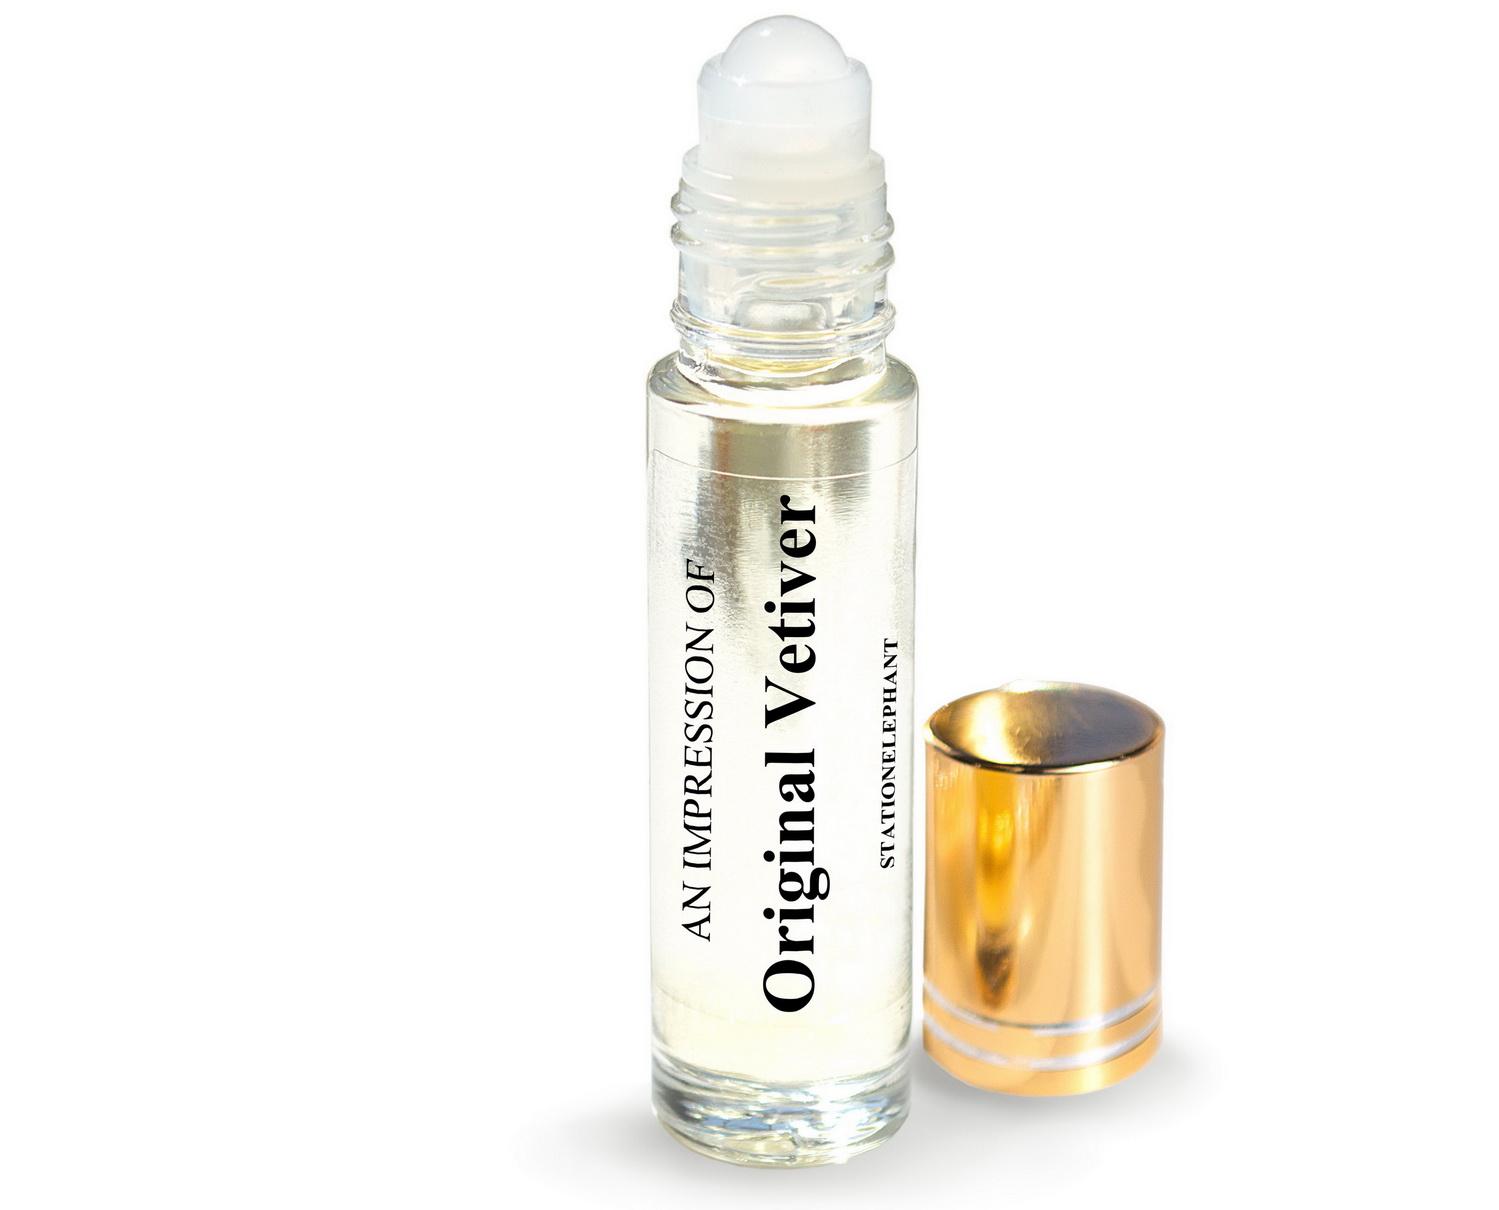 Original Vetiver Type Vegan Perfume Oil by StationElephant.